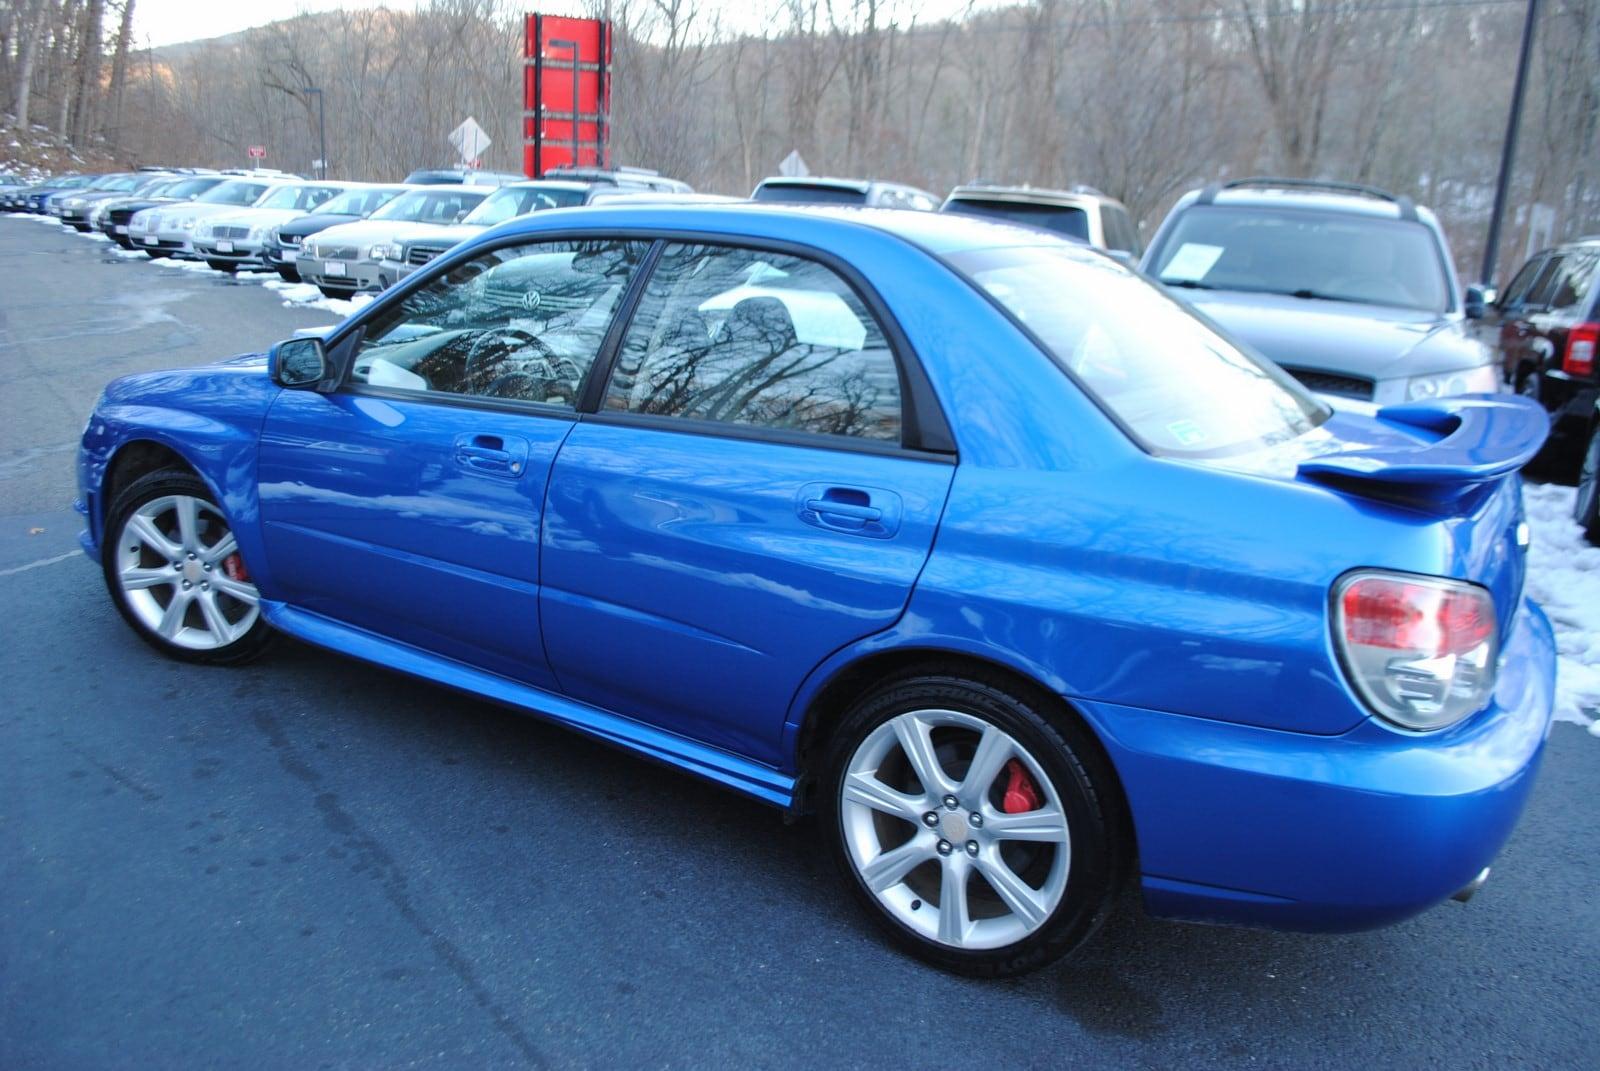 Adventure Subaru Ohio >> Subaru Fb Engine In Vin Code | Autos Post